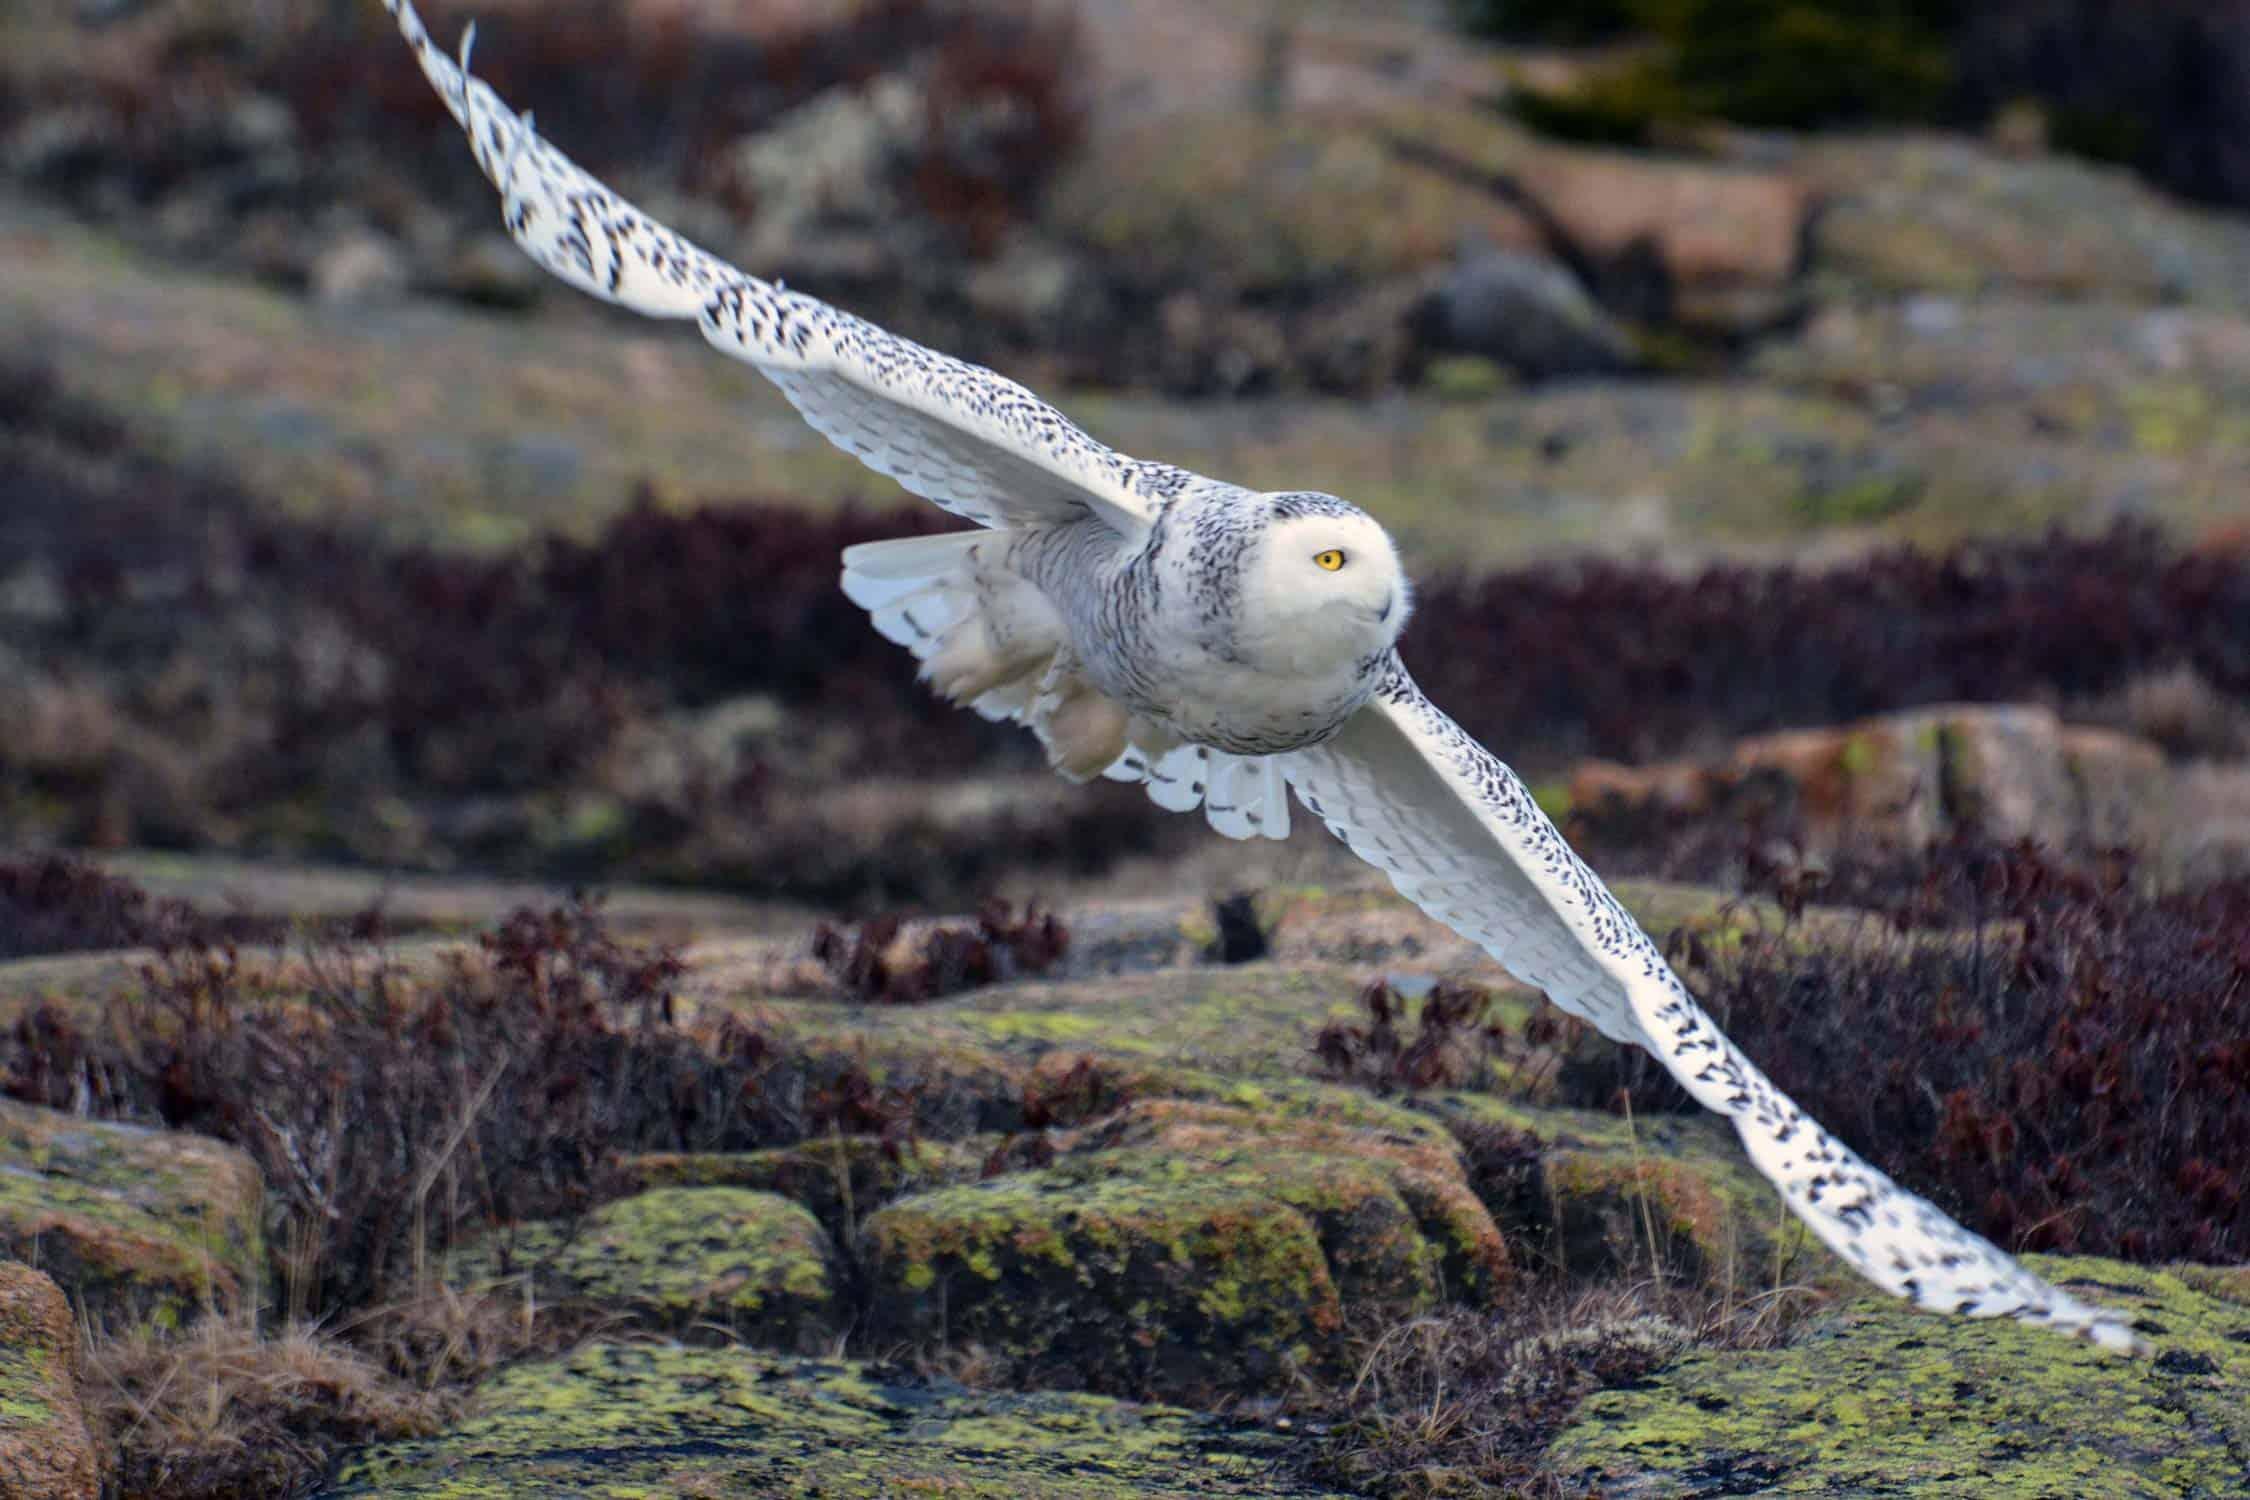 Stephen Ressel, Snowy Owl, Sargent Mountain, Mount Desert Island, 2017